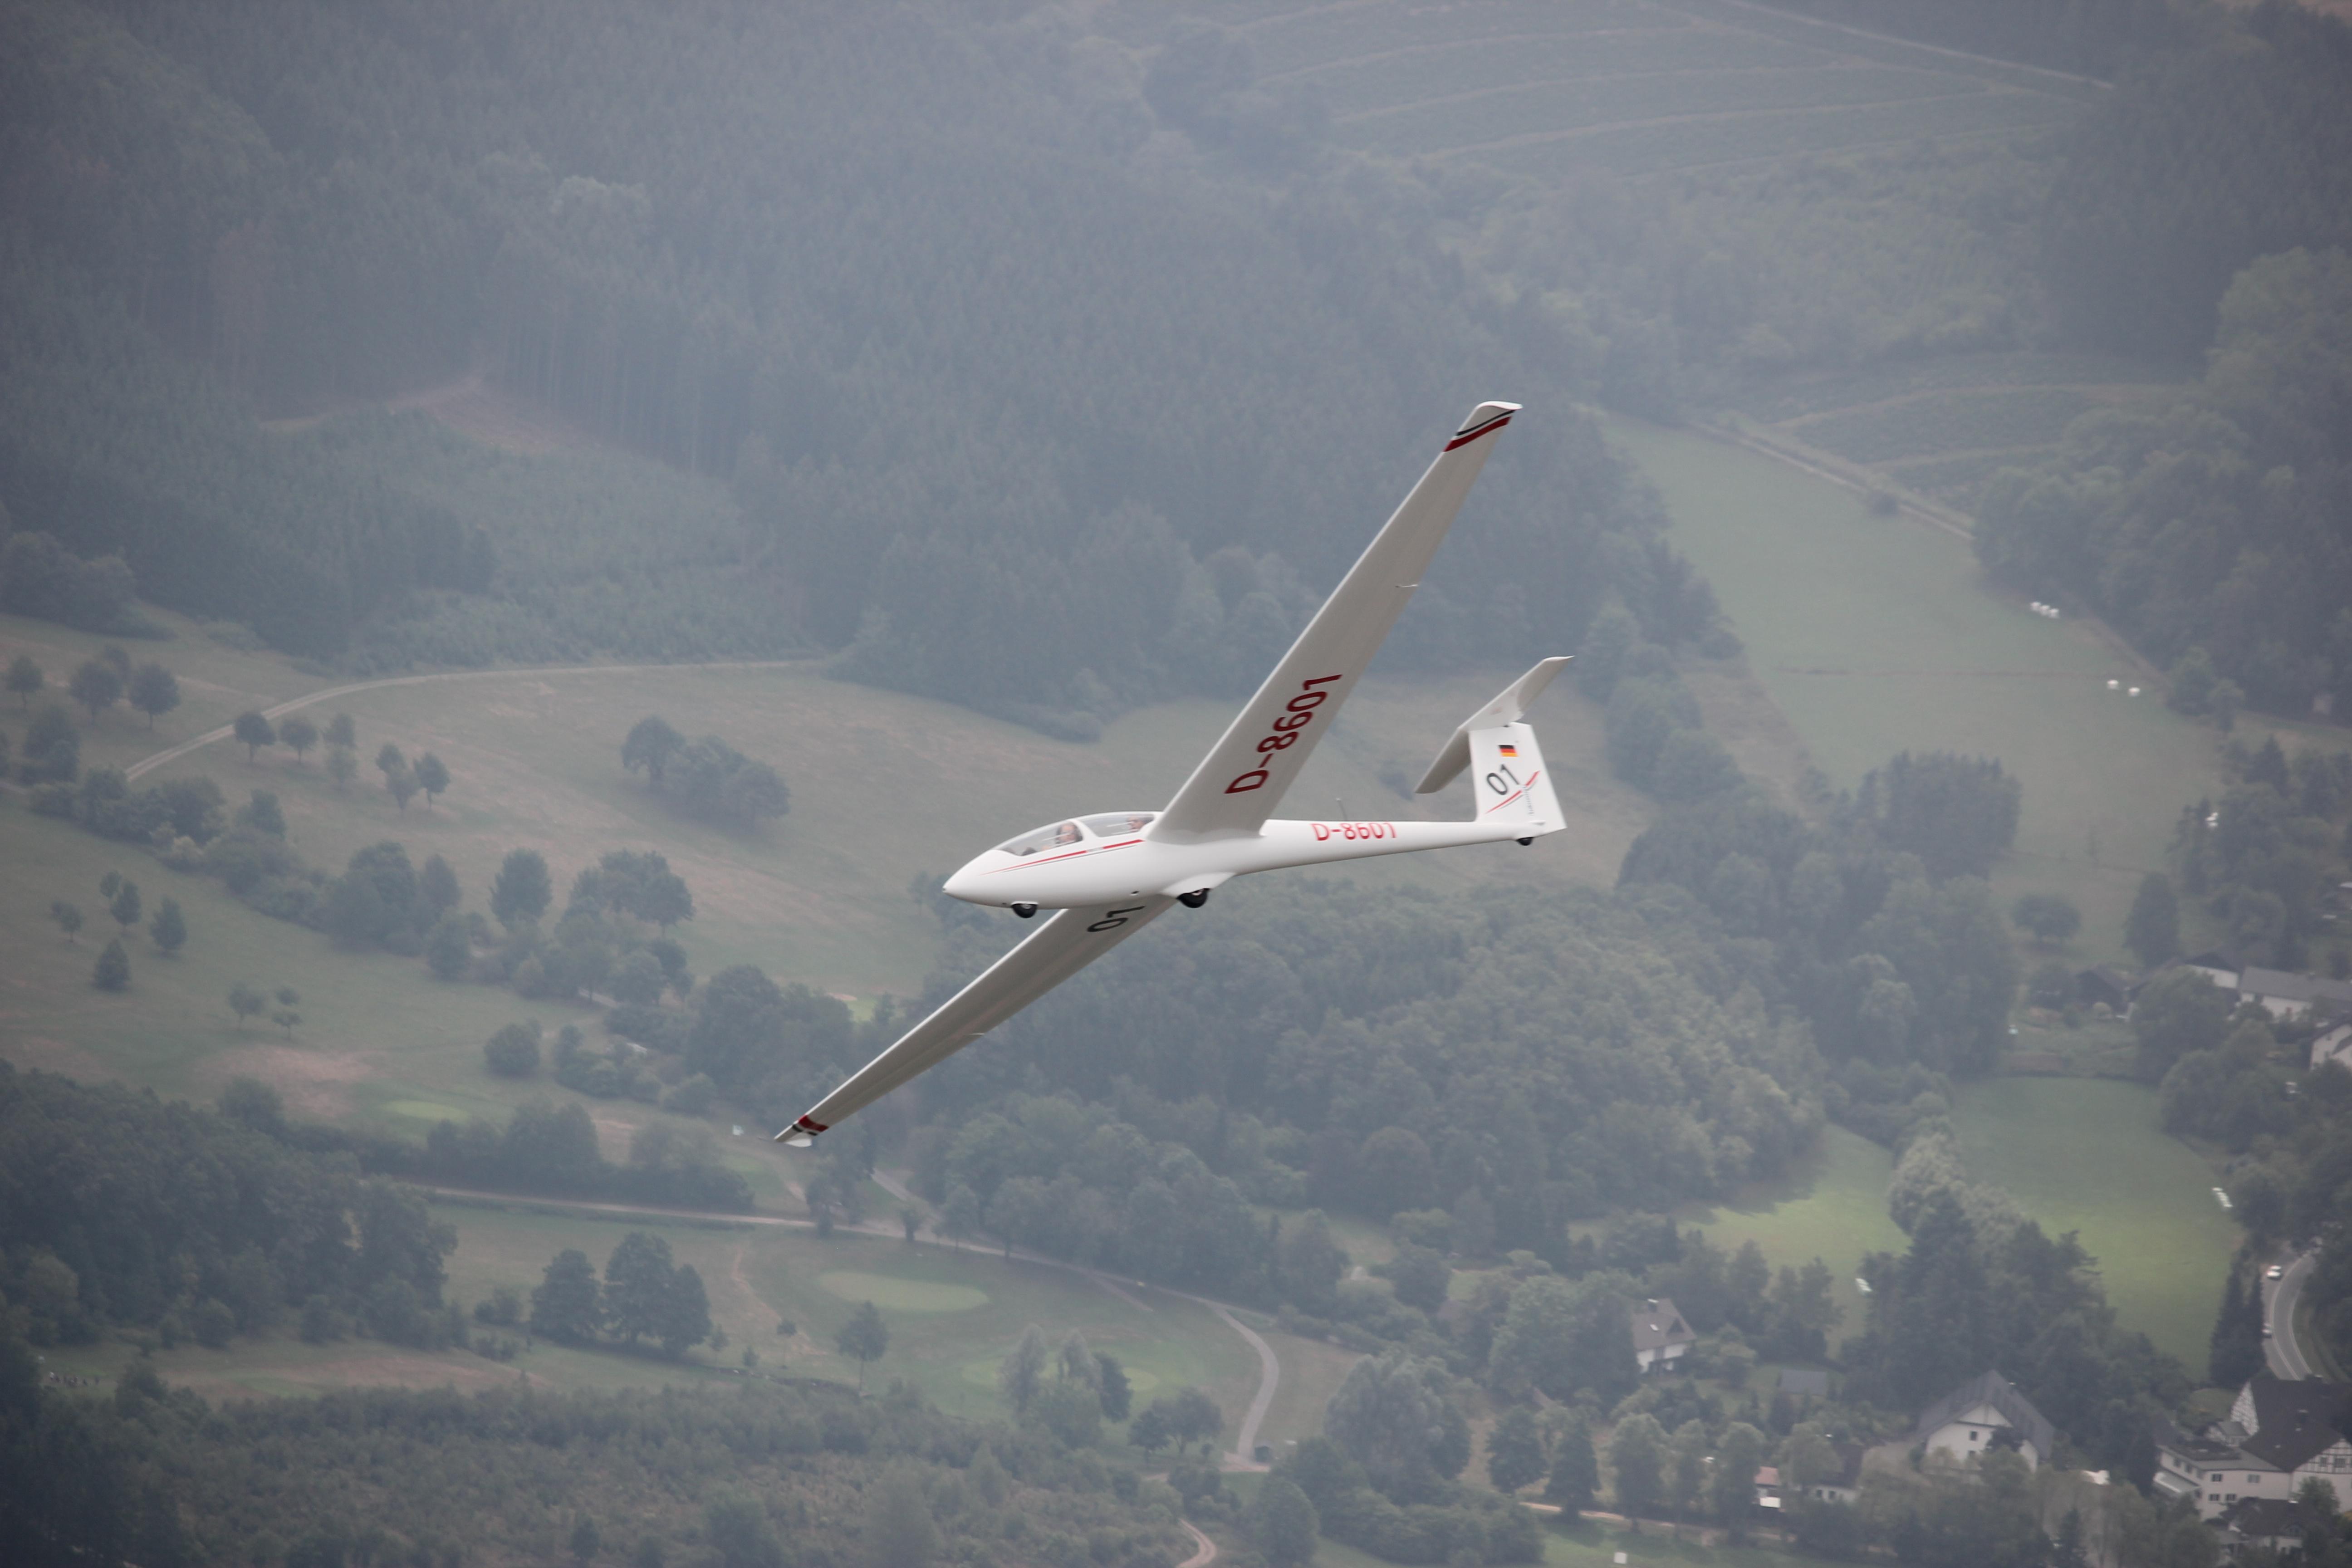 Sommerlehrgang mit neuem Segelflugzeug